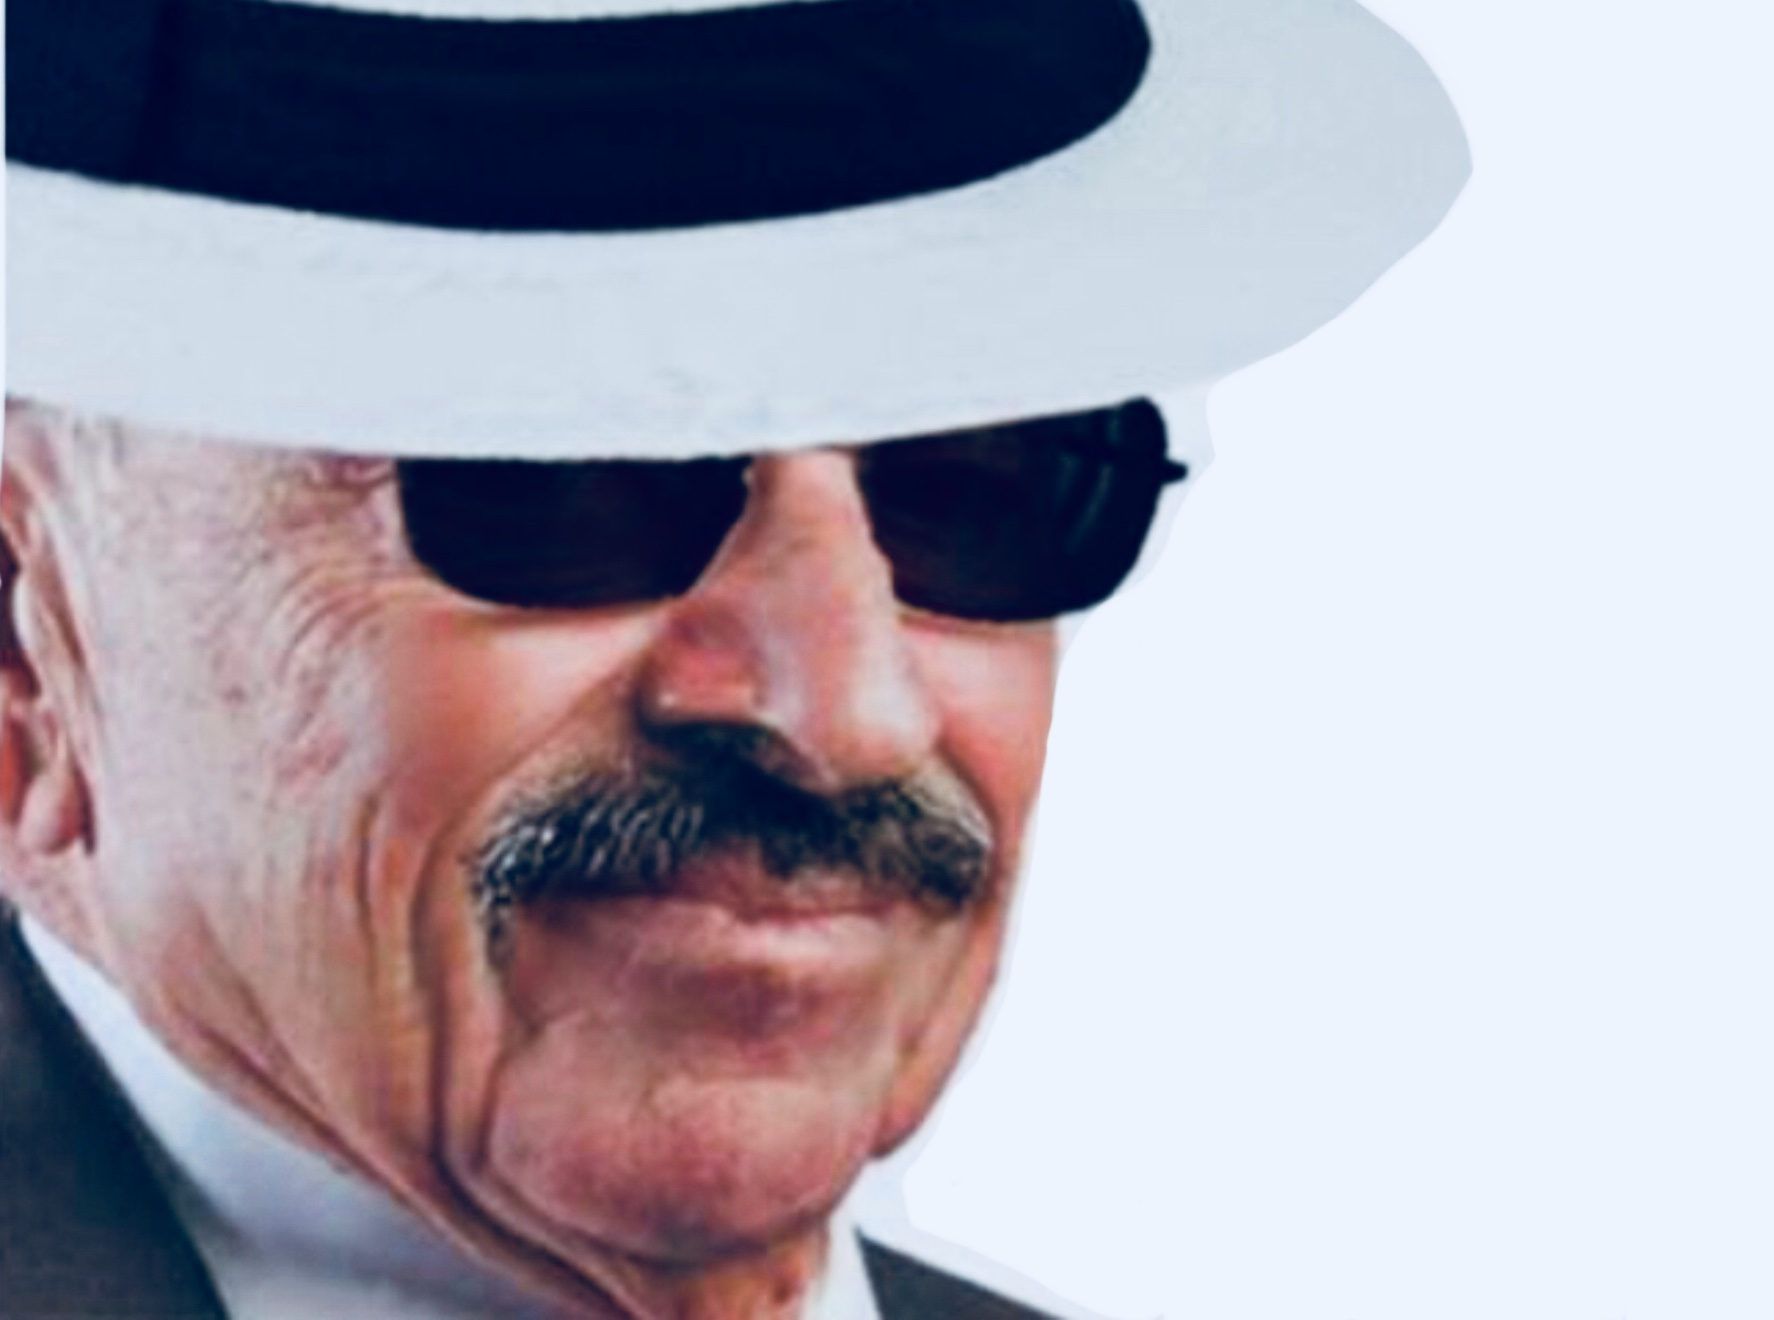 Sticker larry moustache silverstein la chance chapeau lunette noir chance larry borsalino teinte silence cache complot incognito cache norage rire sourire louche